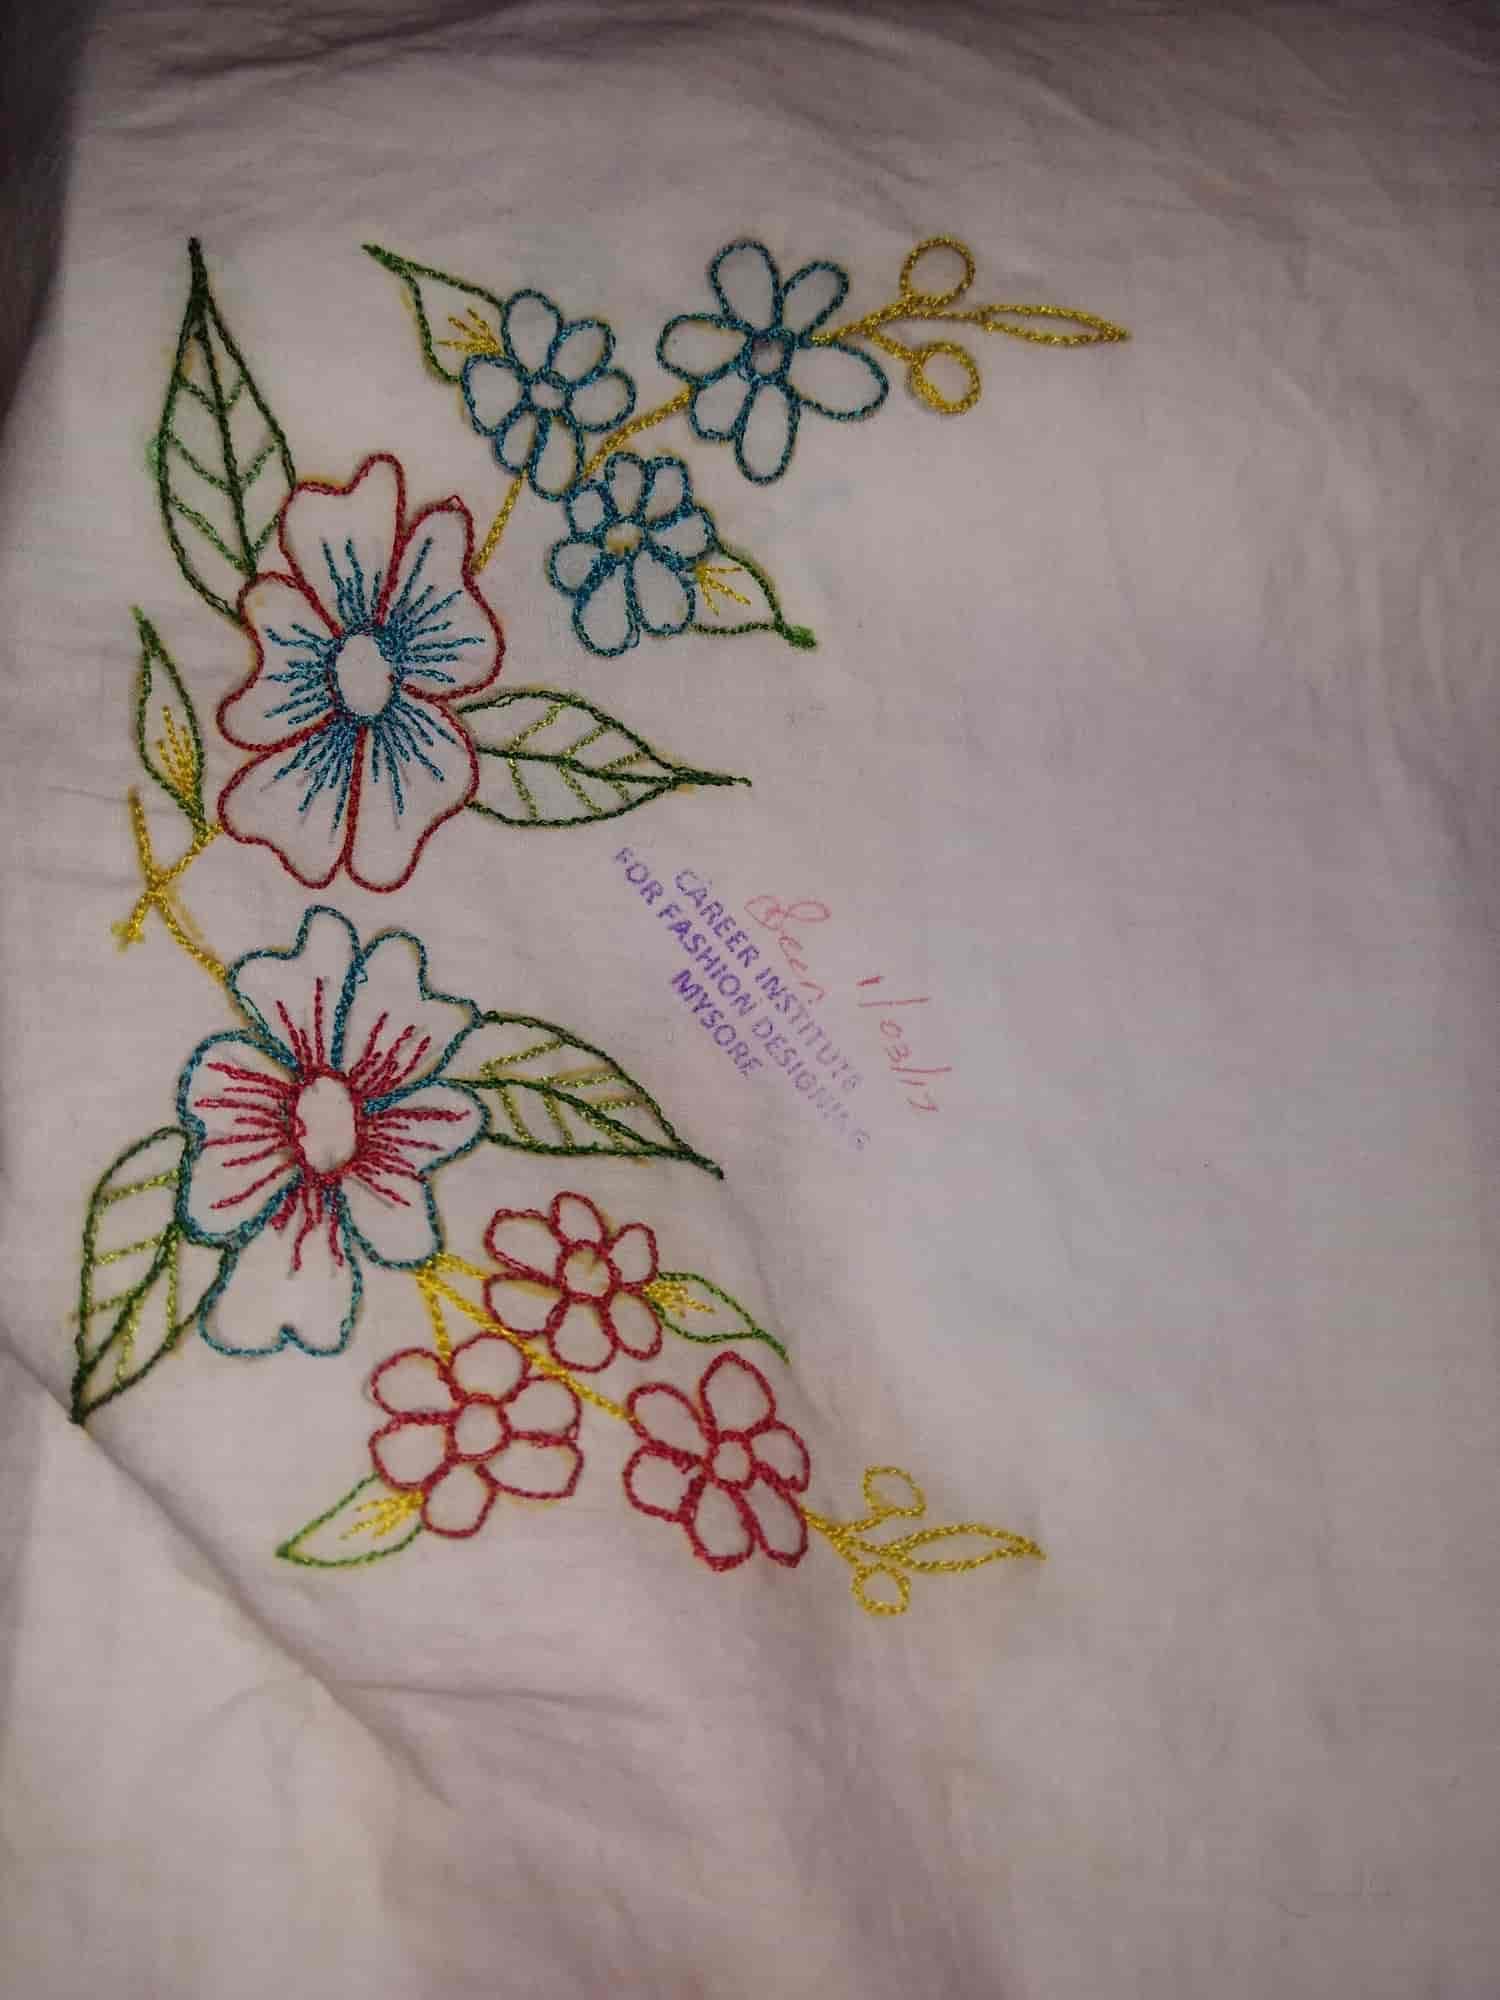 5e47b3f5e4a ... Embroidery Design Work - Career Institute For Fashion Designing Photos